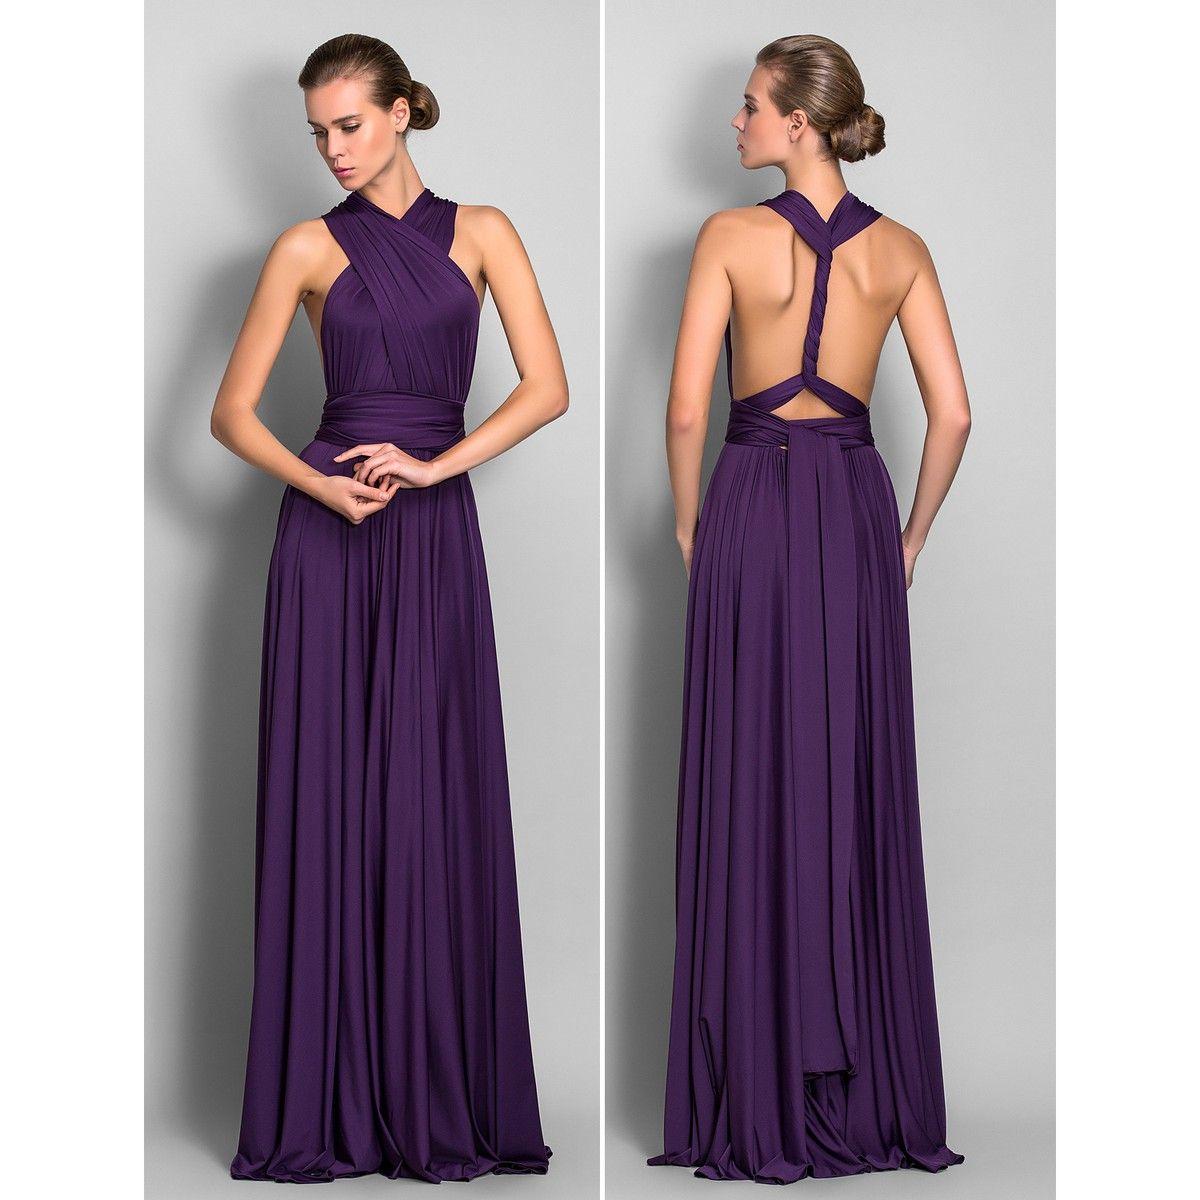 Strapless bra for wedding dress plus size  ALine Strapless One Shoulder Vneck Floor Length Jersey Bridesmaid